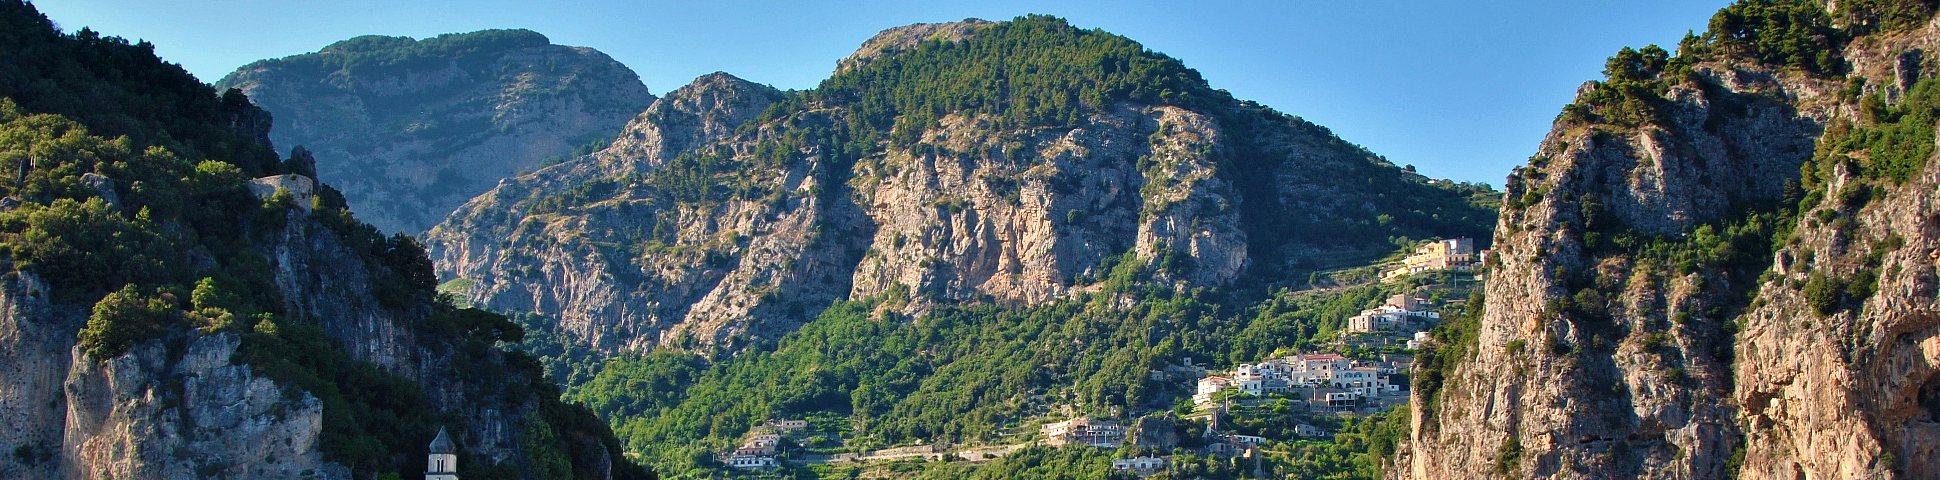 Campania in Italy